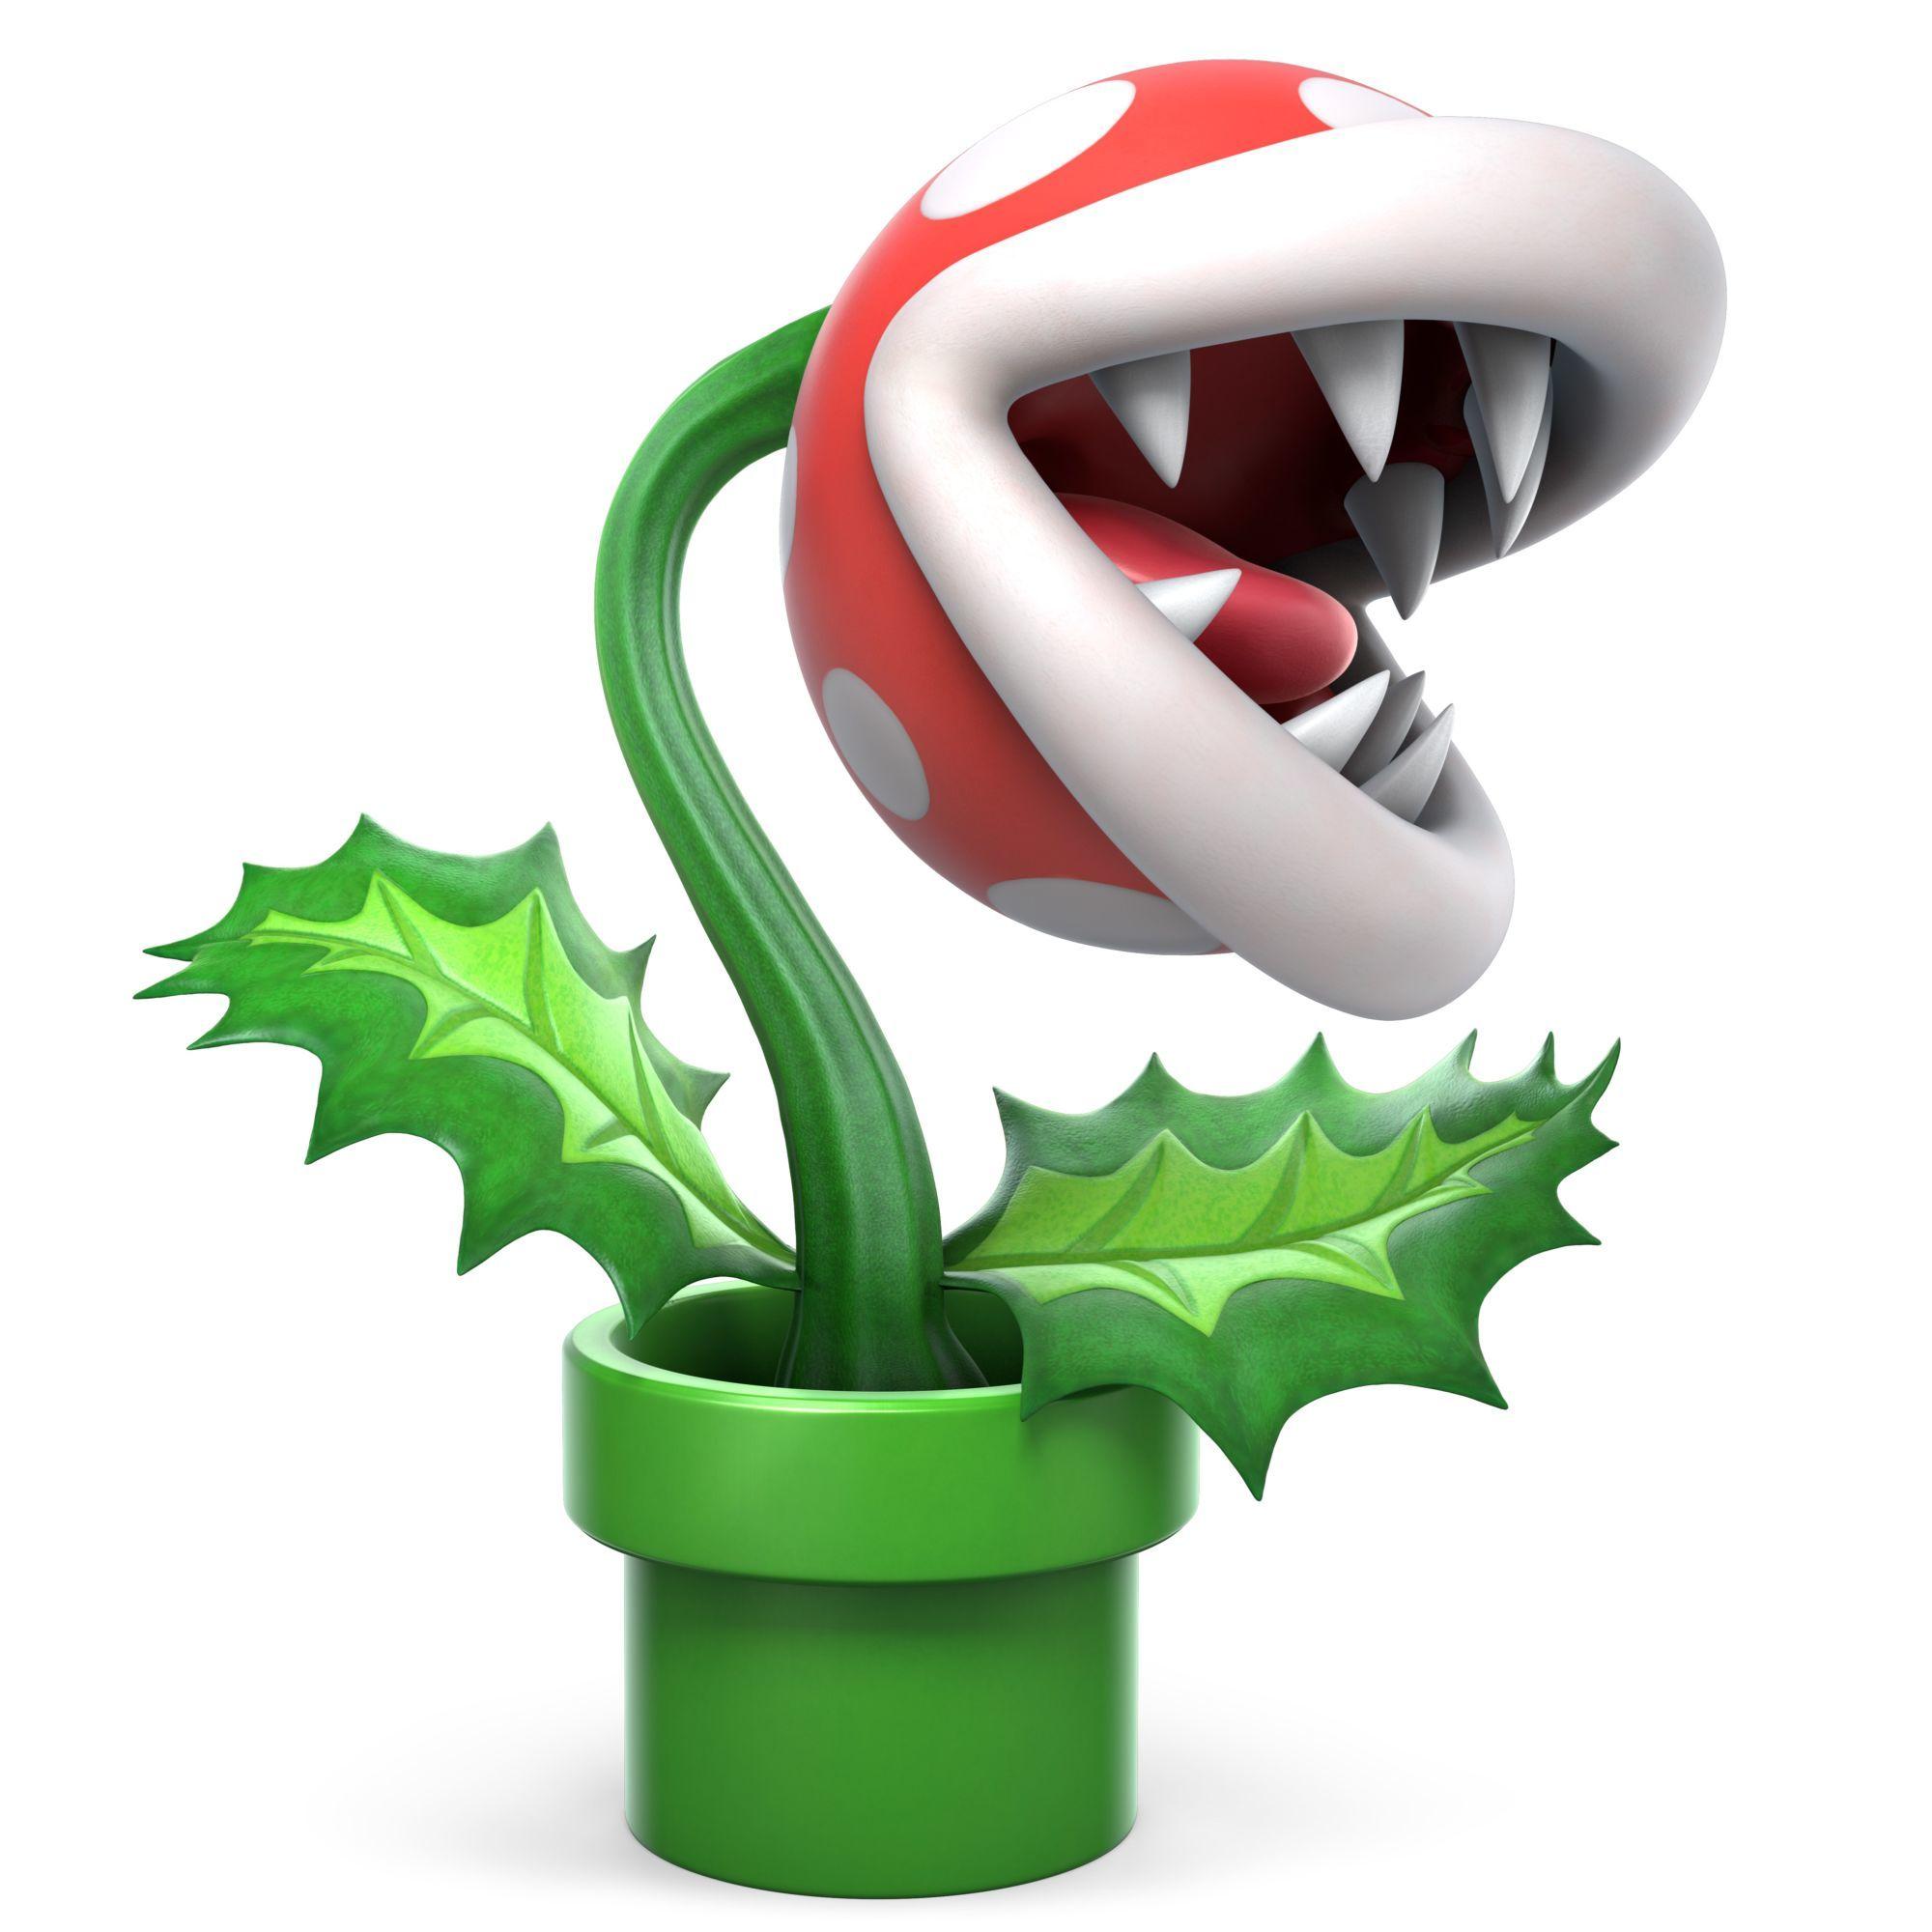 Piranha Plant Set For Super Smash Bros  Ultimate in February